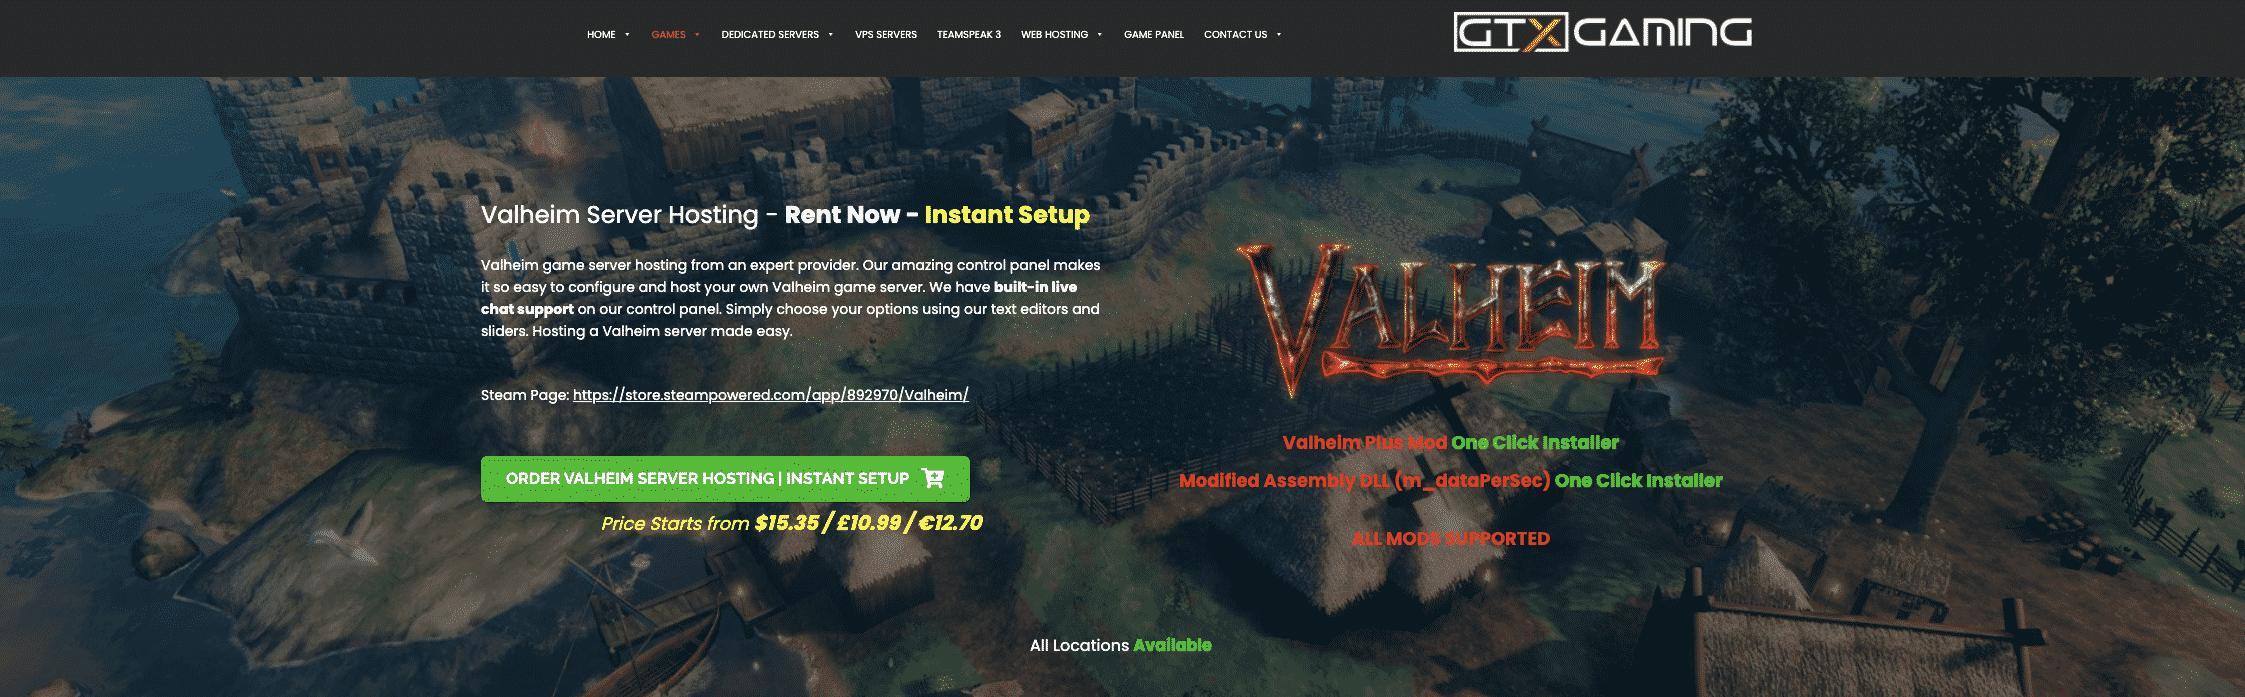 GTX Gaming Valheim Hosting